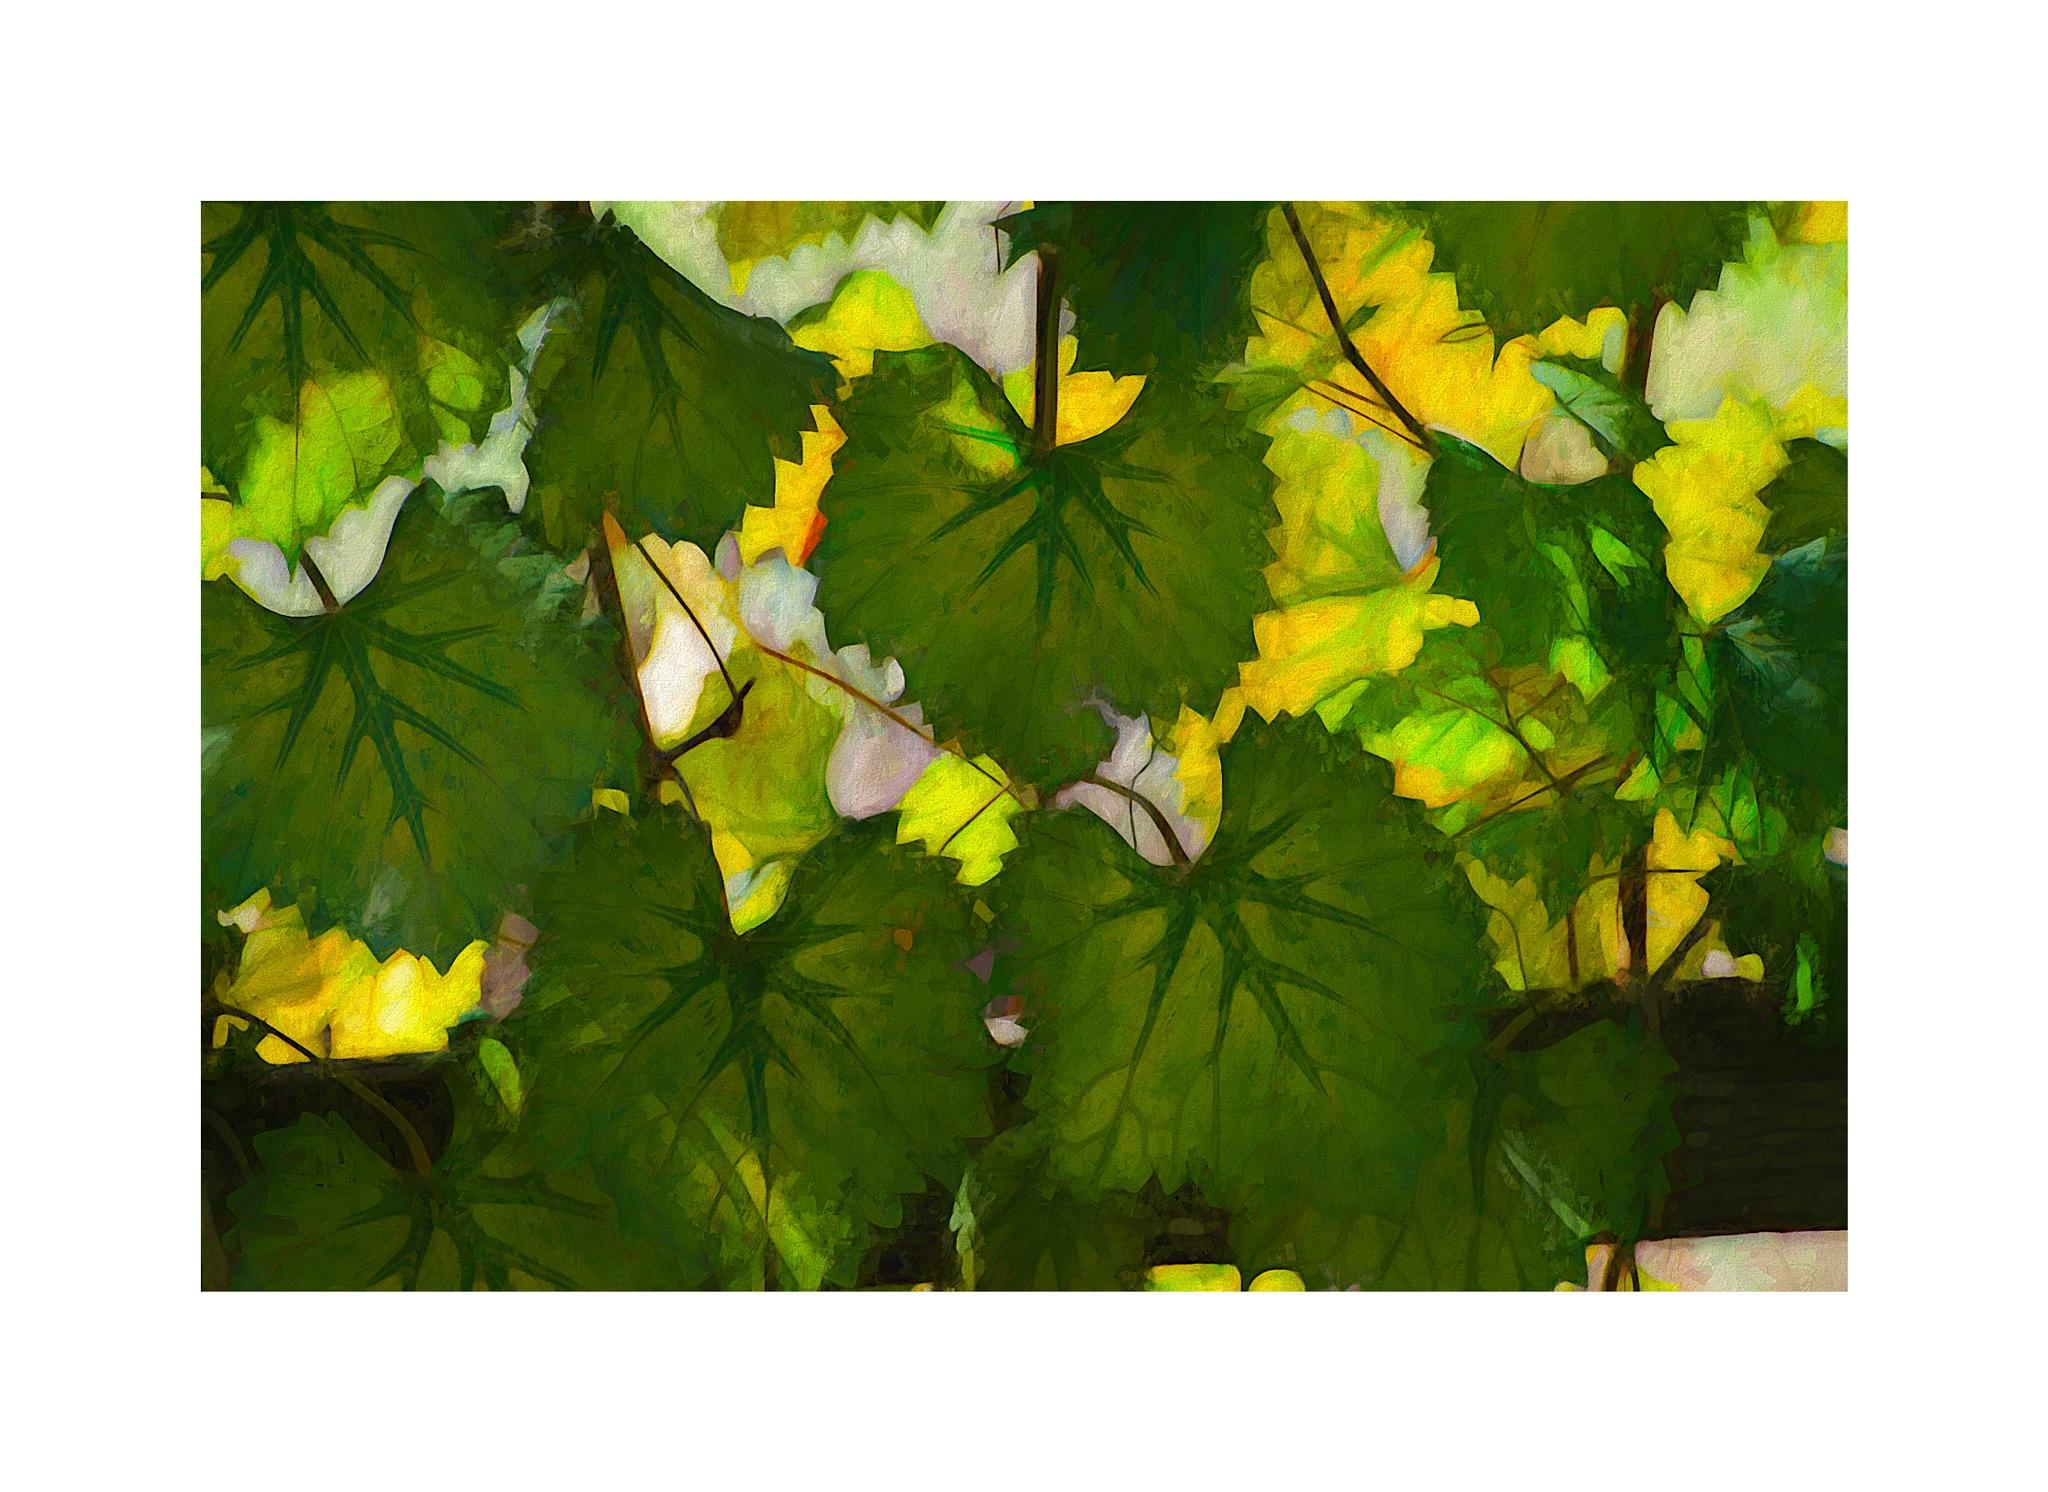 In Martha's Vineyard by JohnEllingson